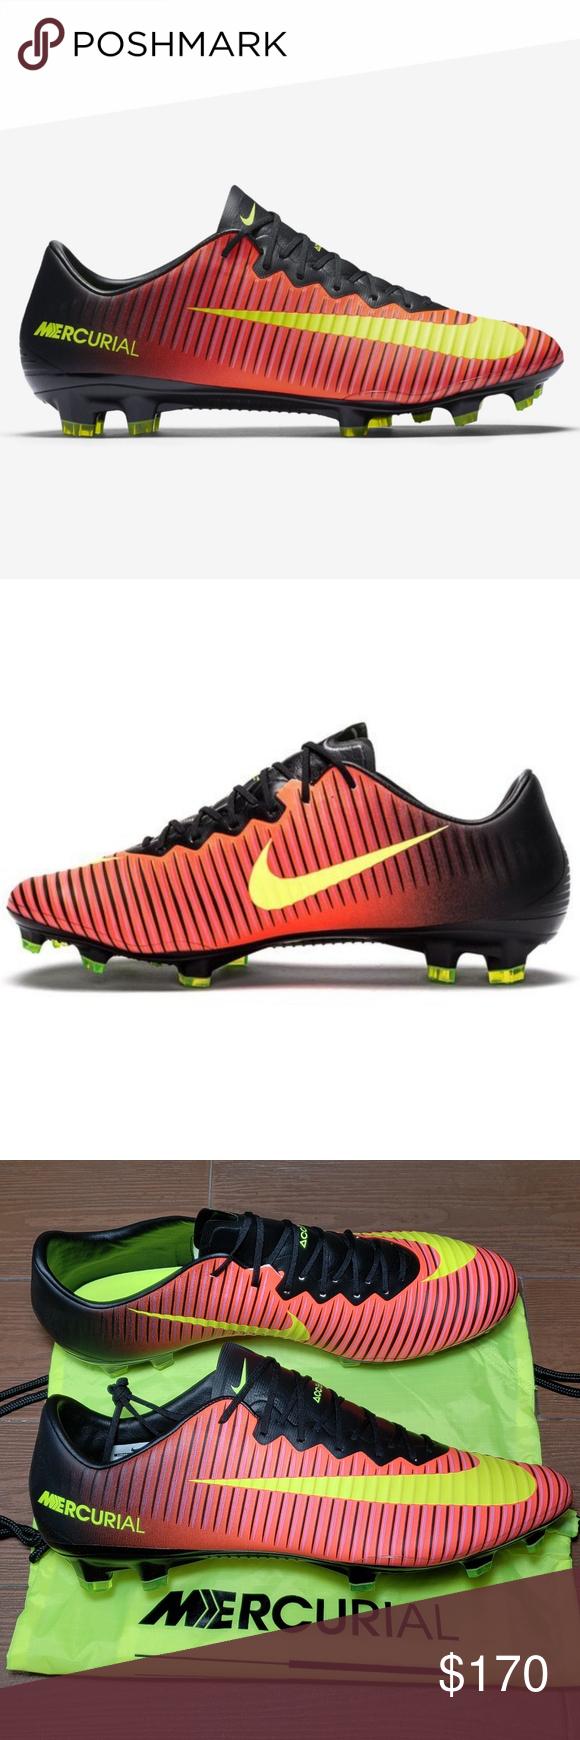 ac2876a256f Nike Mercurial Vapor XI FG Soccer Cleats VoltBlack BRAND-NEW Men s Sz 13  (UK 12